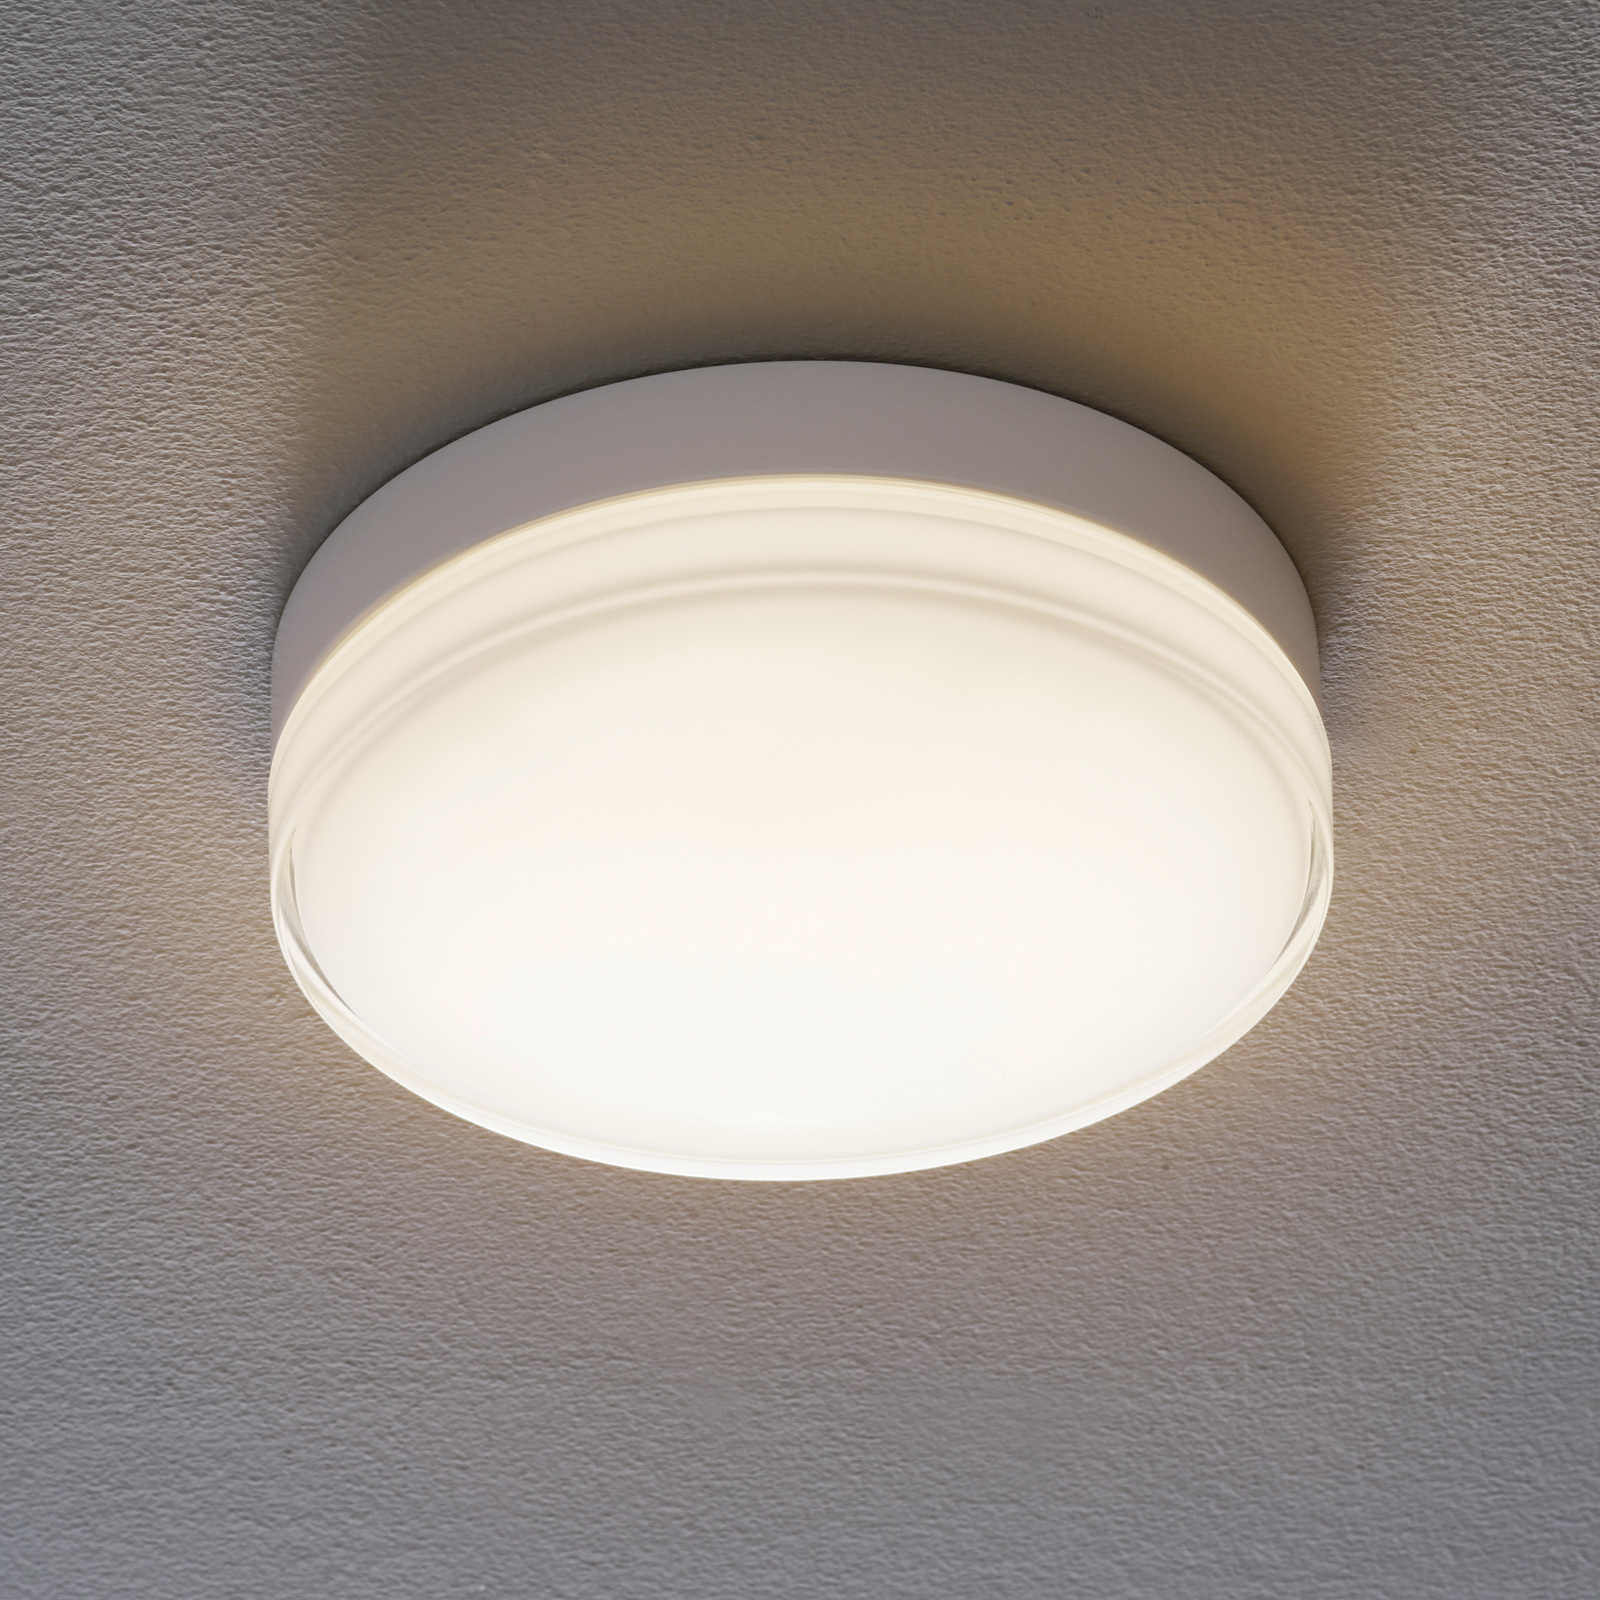 BEGA 12128 LED-Deckenleuchte DALI 930 weiß 26cm